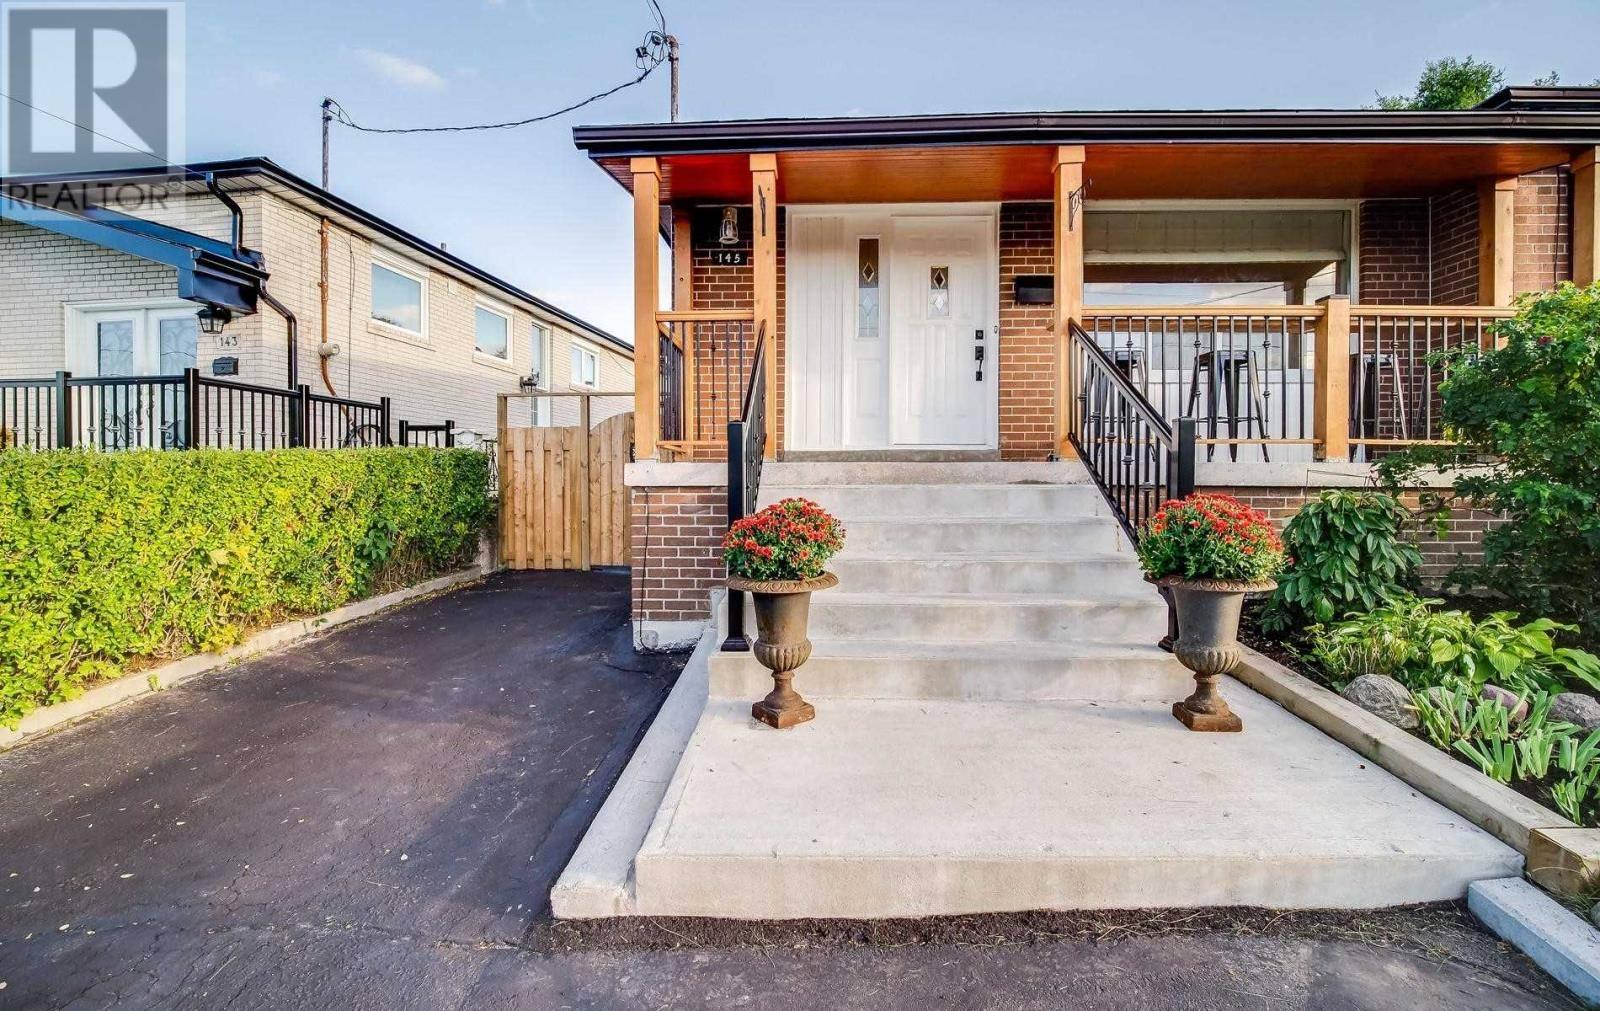 House for sale at 145 Grandravine Dr Toronto Ontario - MLS: W4600624